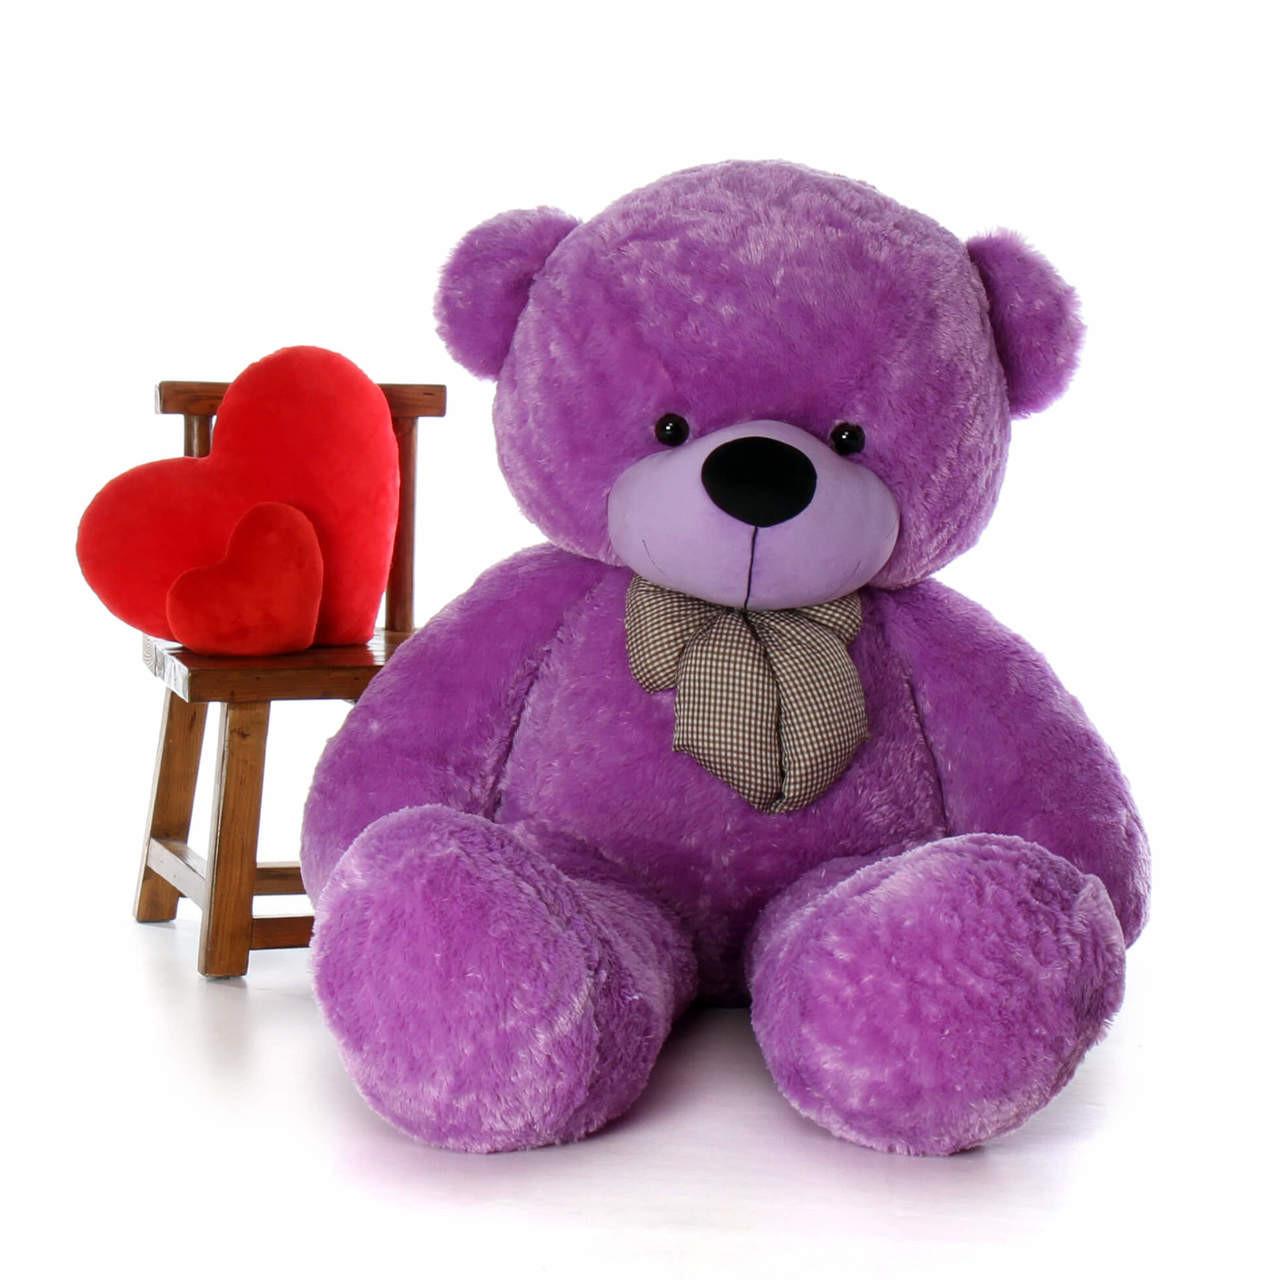 72in life size purple teddy bear is every girl's dream come true DeeDee Cuddles from Giant Teddy